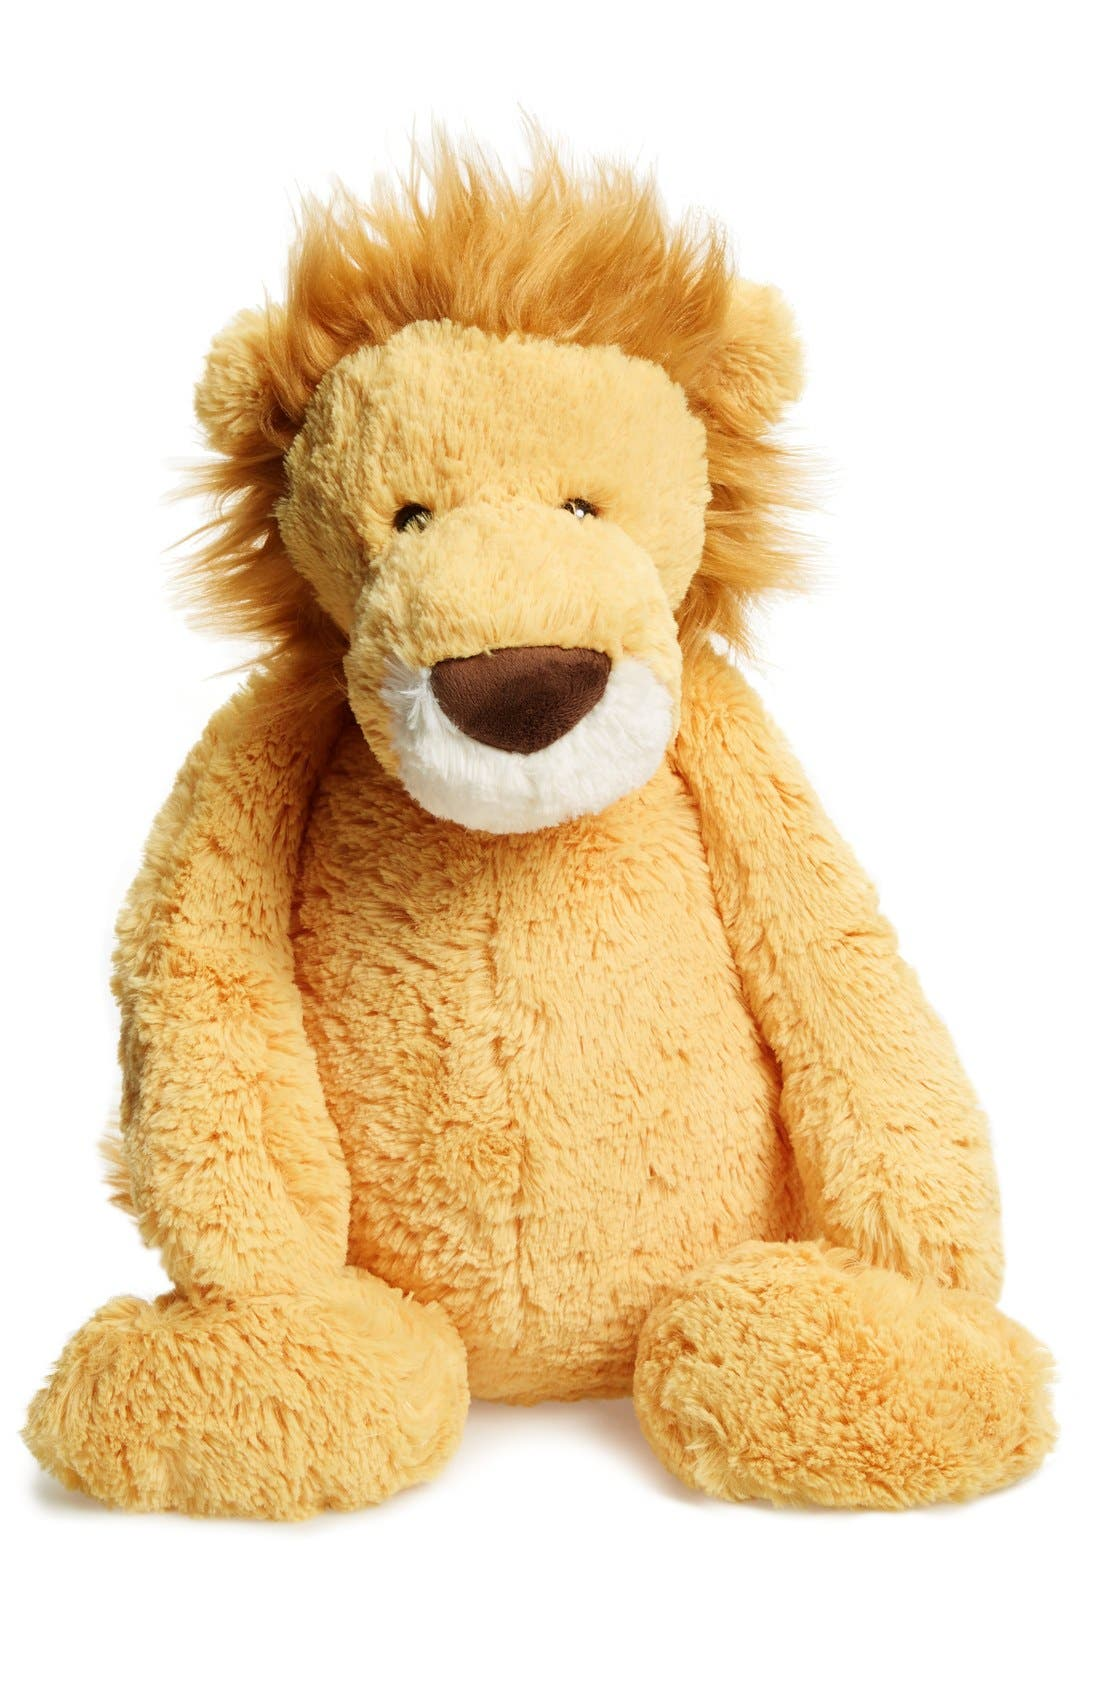 Huge Bashful Lion Stuffed Animal,                             Main thumbnail 1, color,                             Yellow